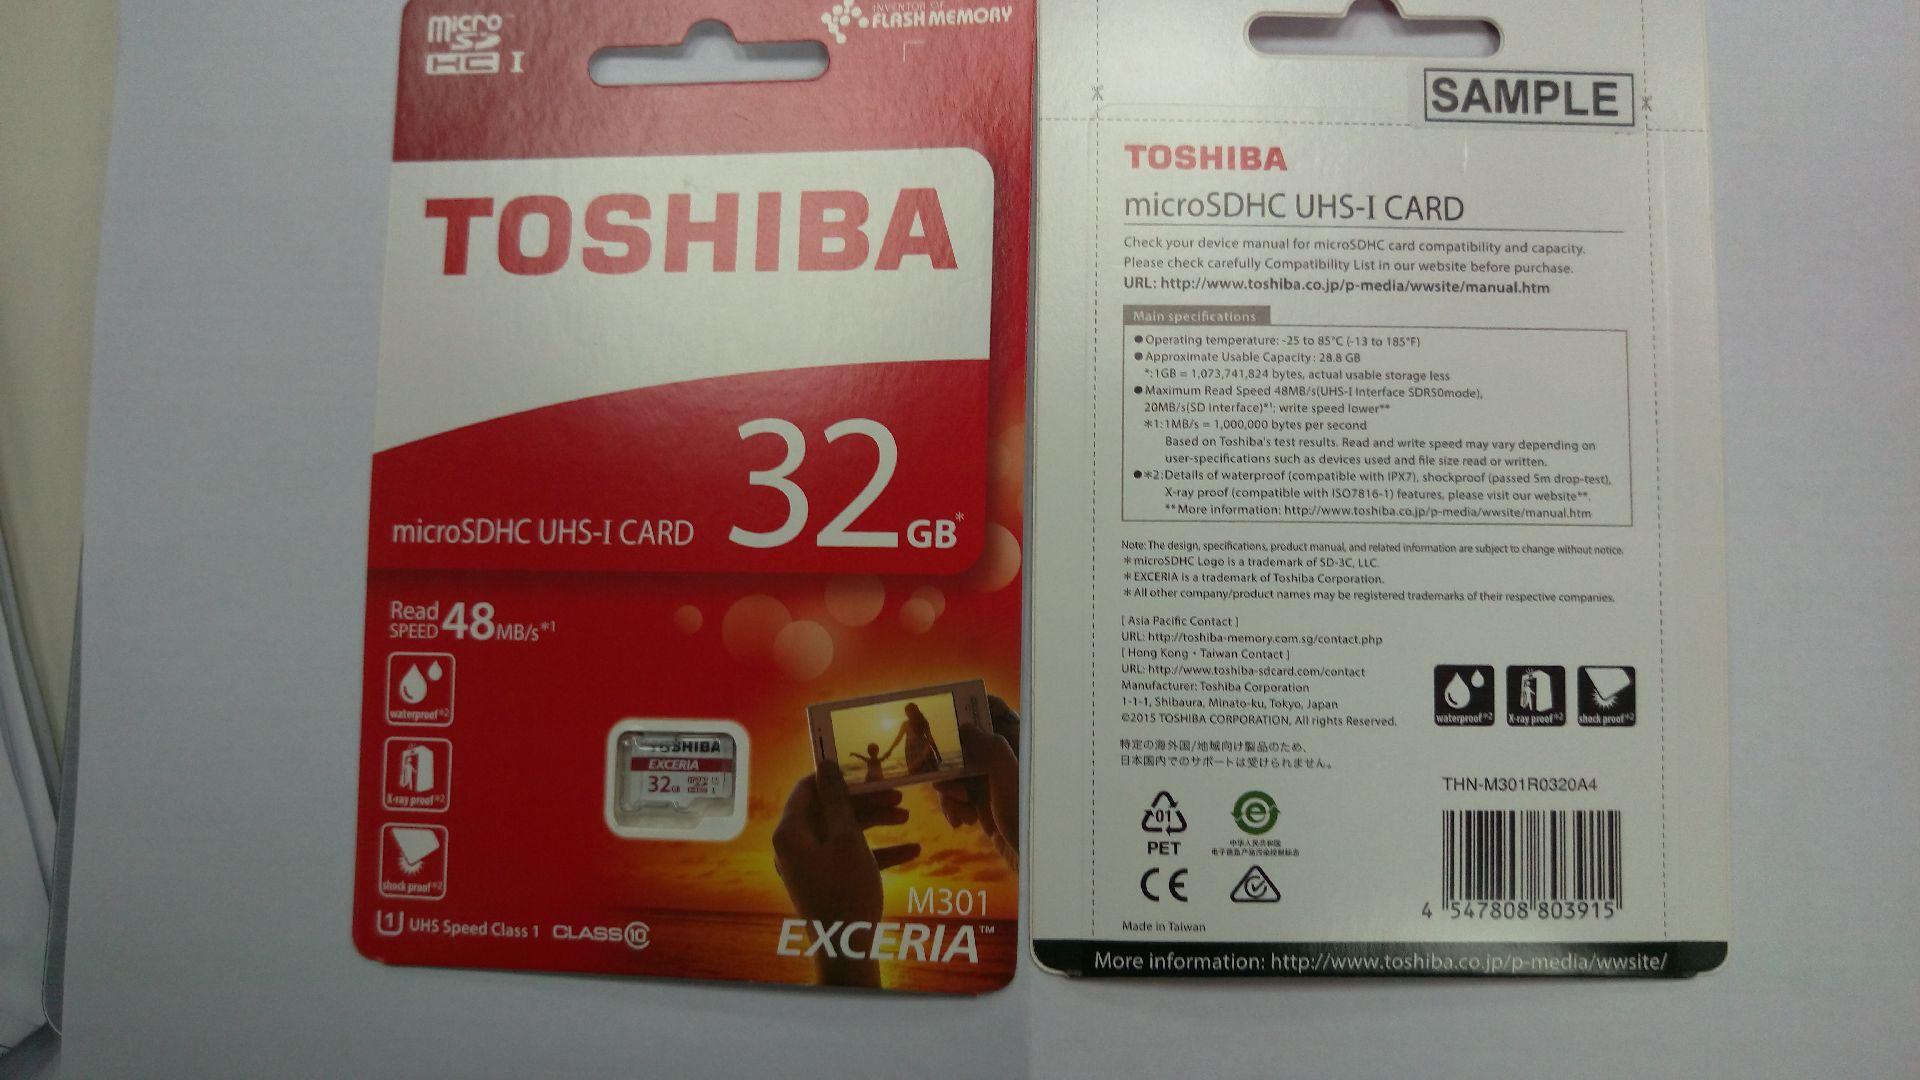 microSDHC【UHS-I】TOSHIBA 32G 記憶卡(THN-M301R0320A4)